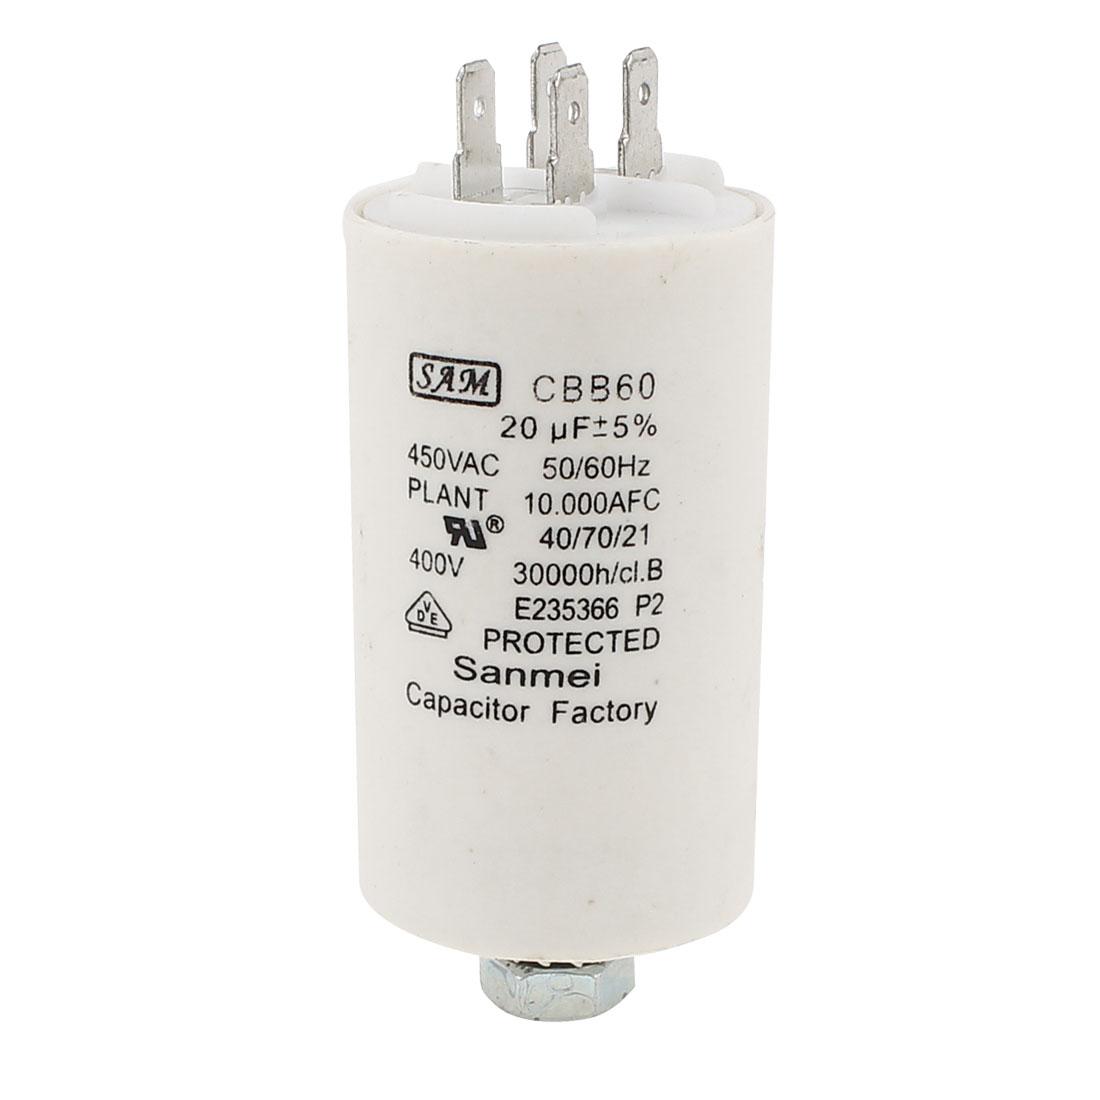 AC450V 50/60Hz 20uF Cylindrical Polypropylene Film Motor Capacitor CBB60